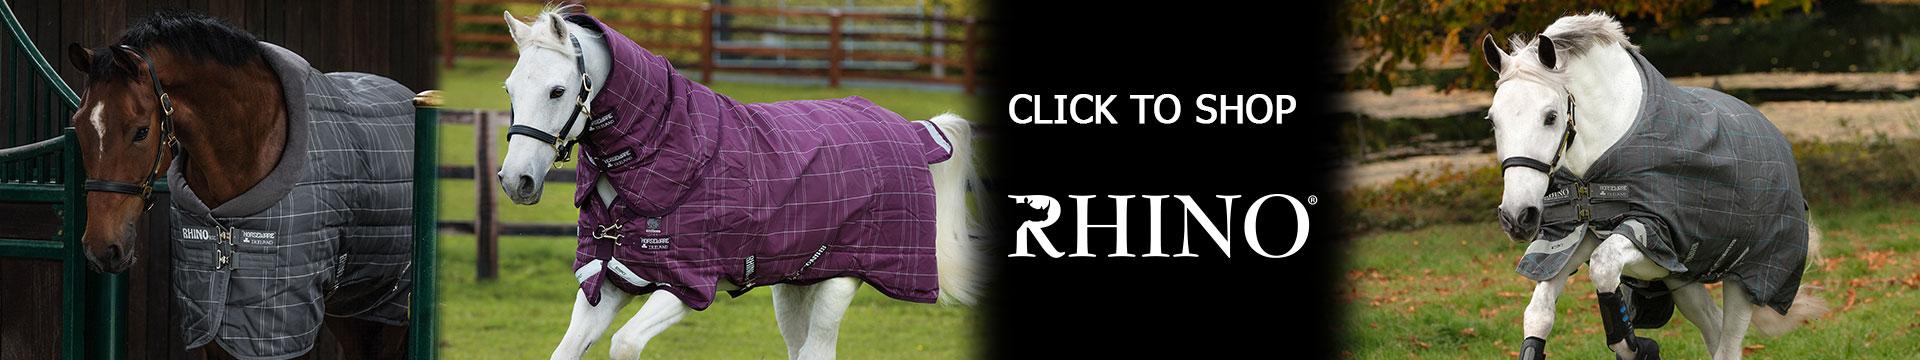 Click to Shop All Rhino